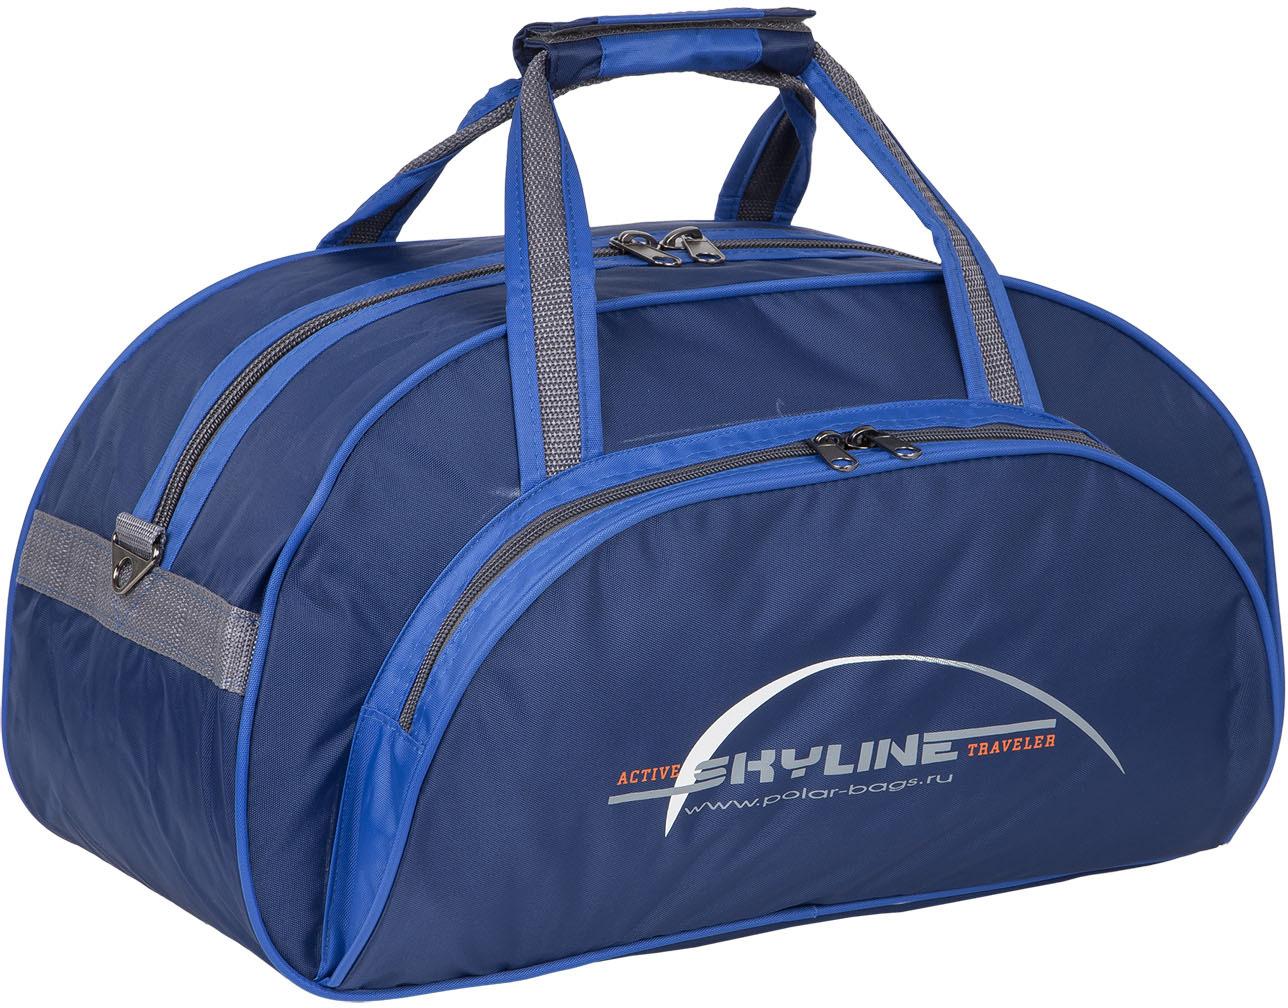 сумки переноски Сумка спортивная Polar Скайлайн, цвет: синий, голубой, серый, 25 л